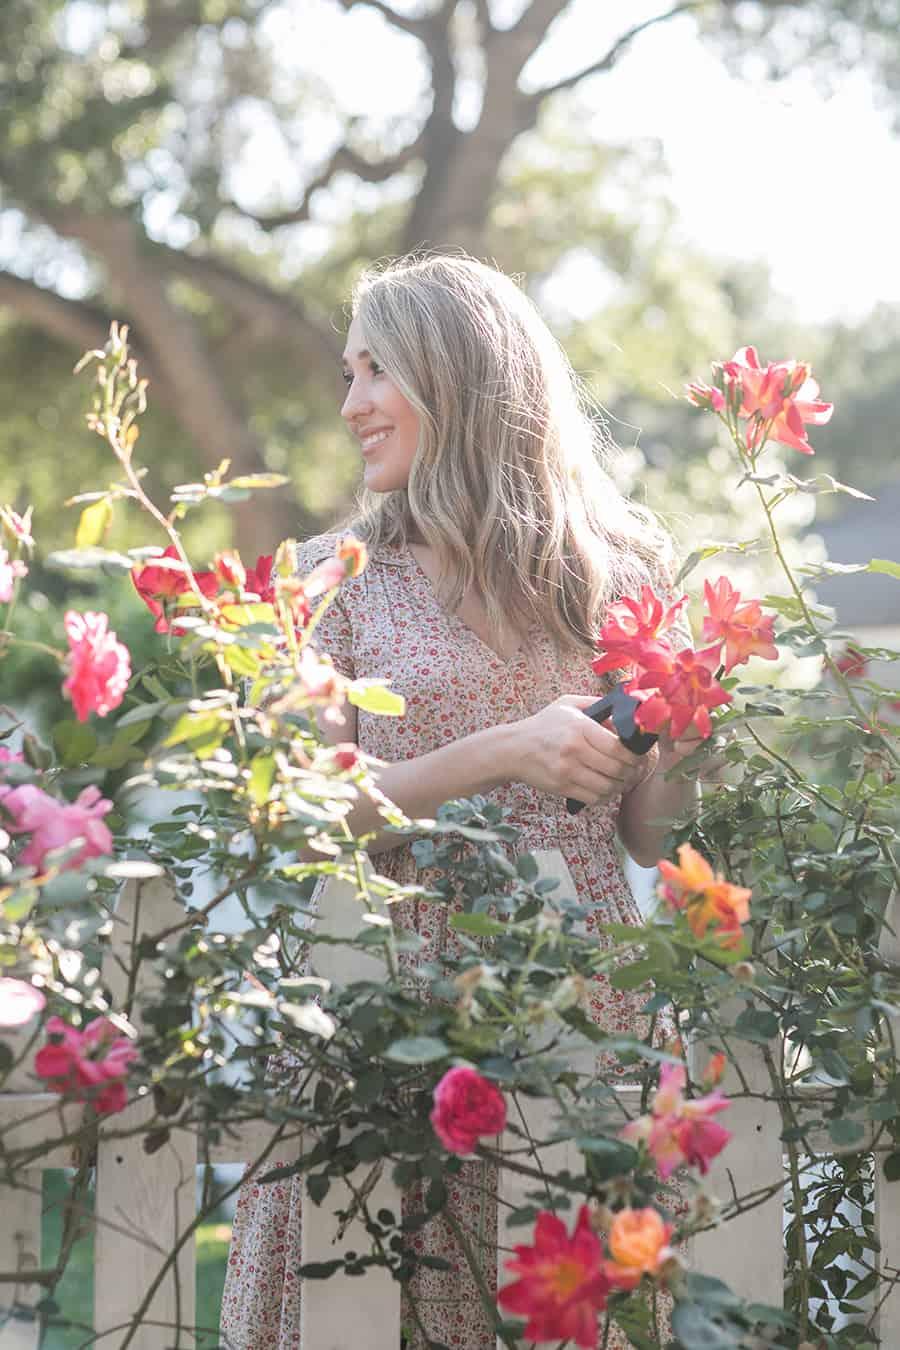 Eden Passante clipping roses in her garden